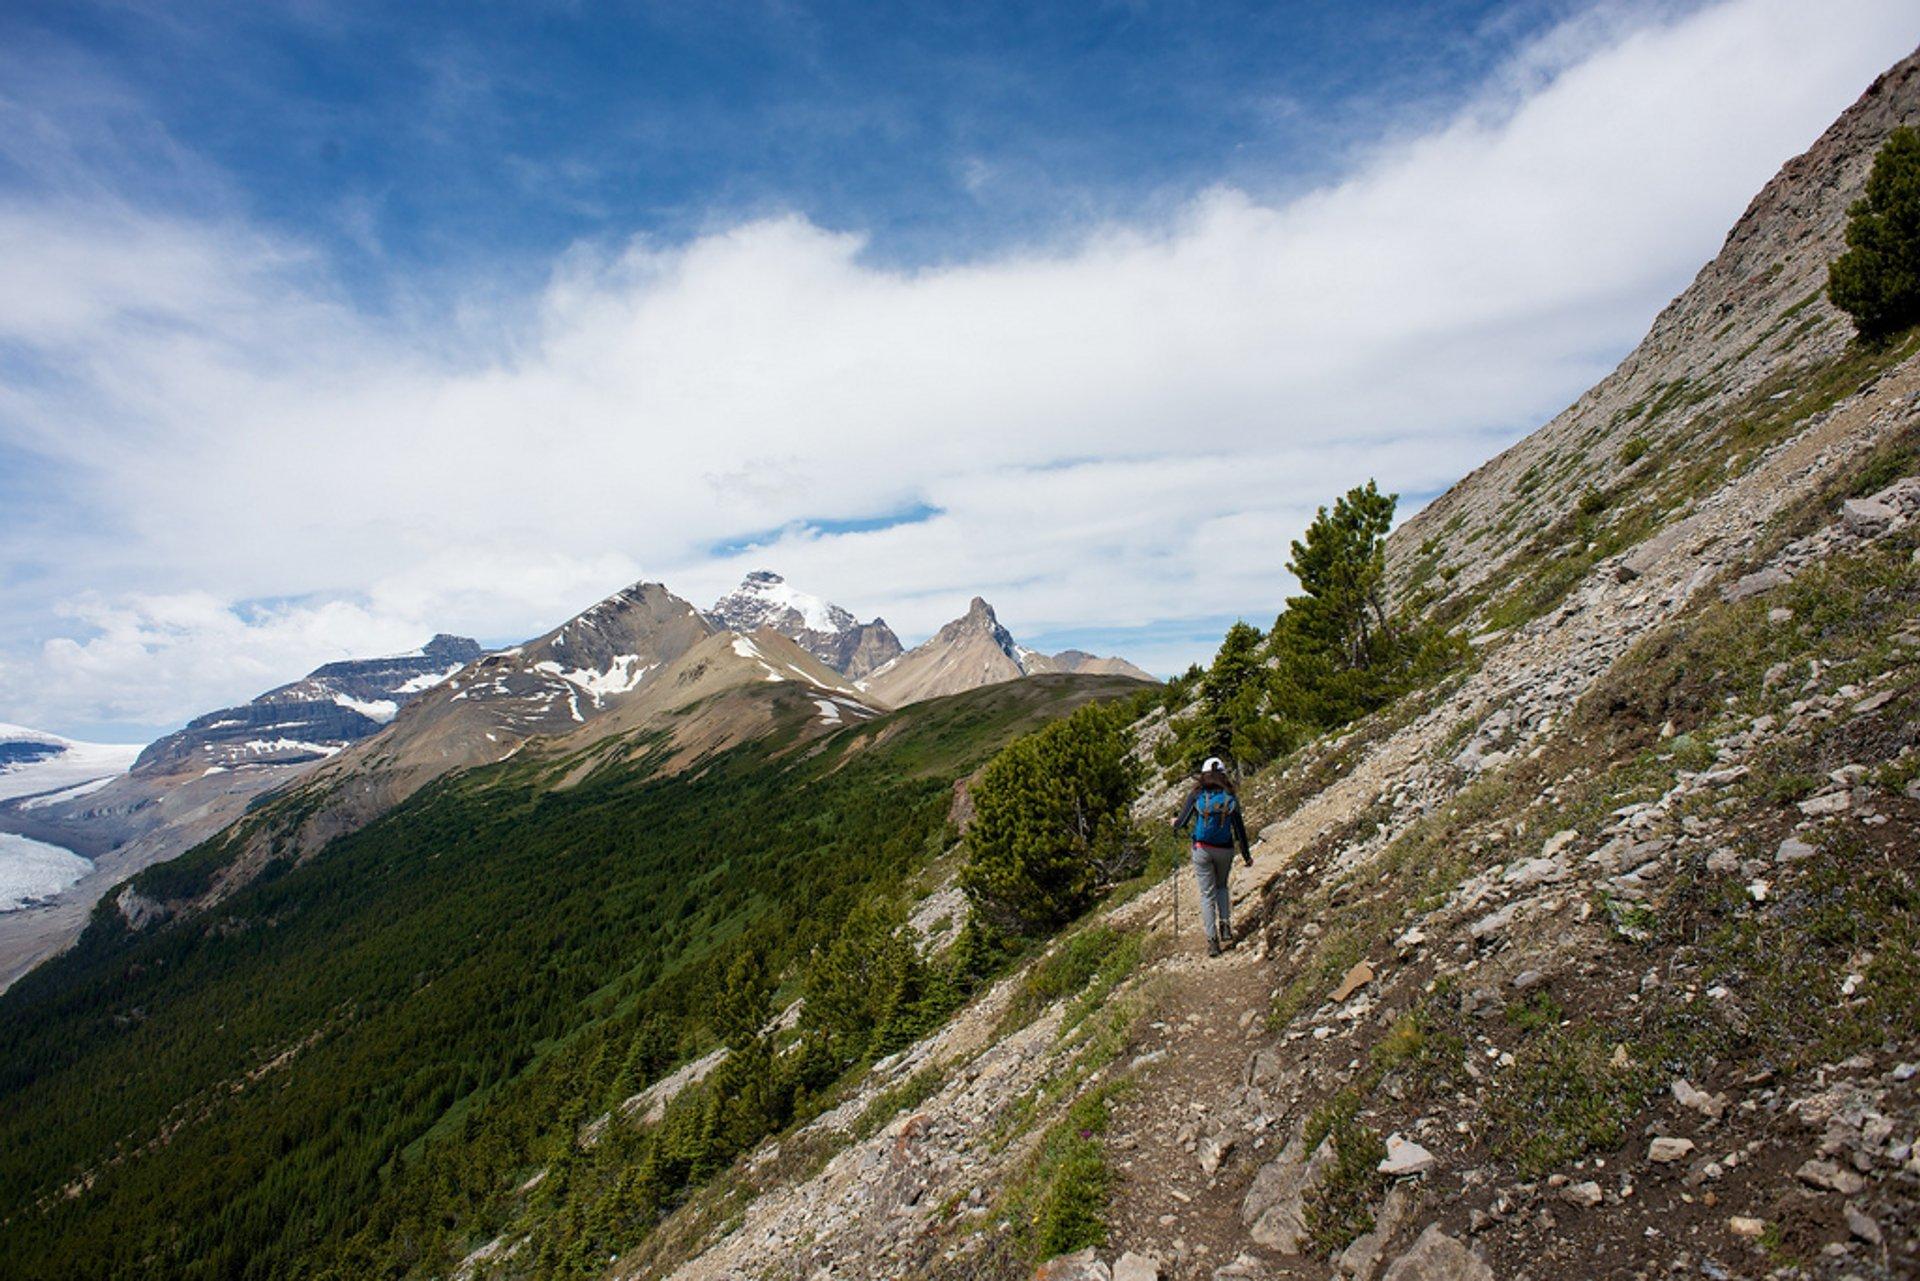 Parker Ridge Trail in Banff & Jasper National Parks 2020 - Best Time